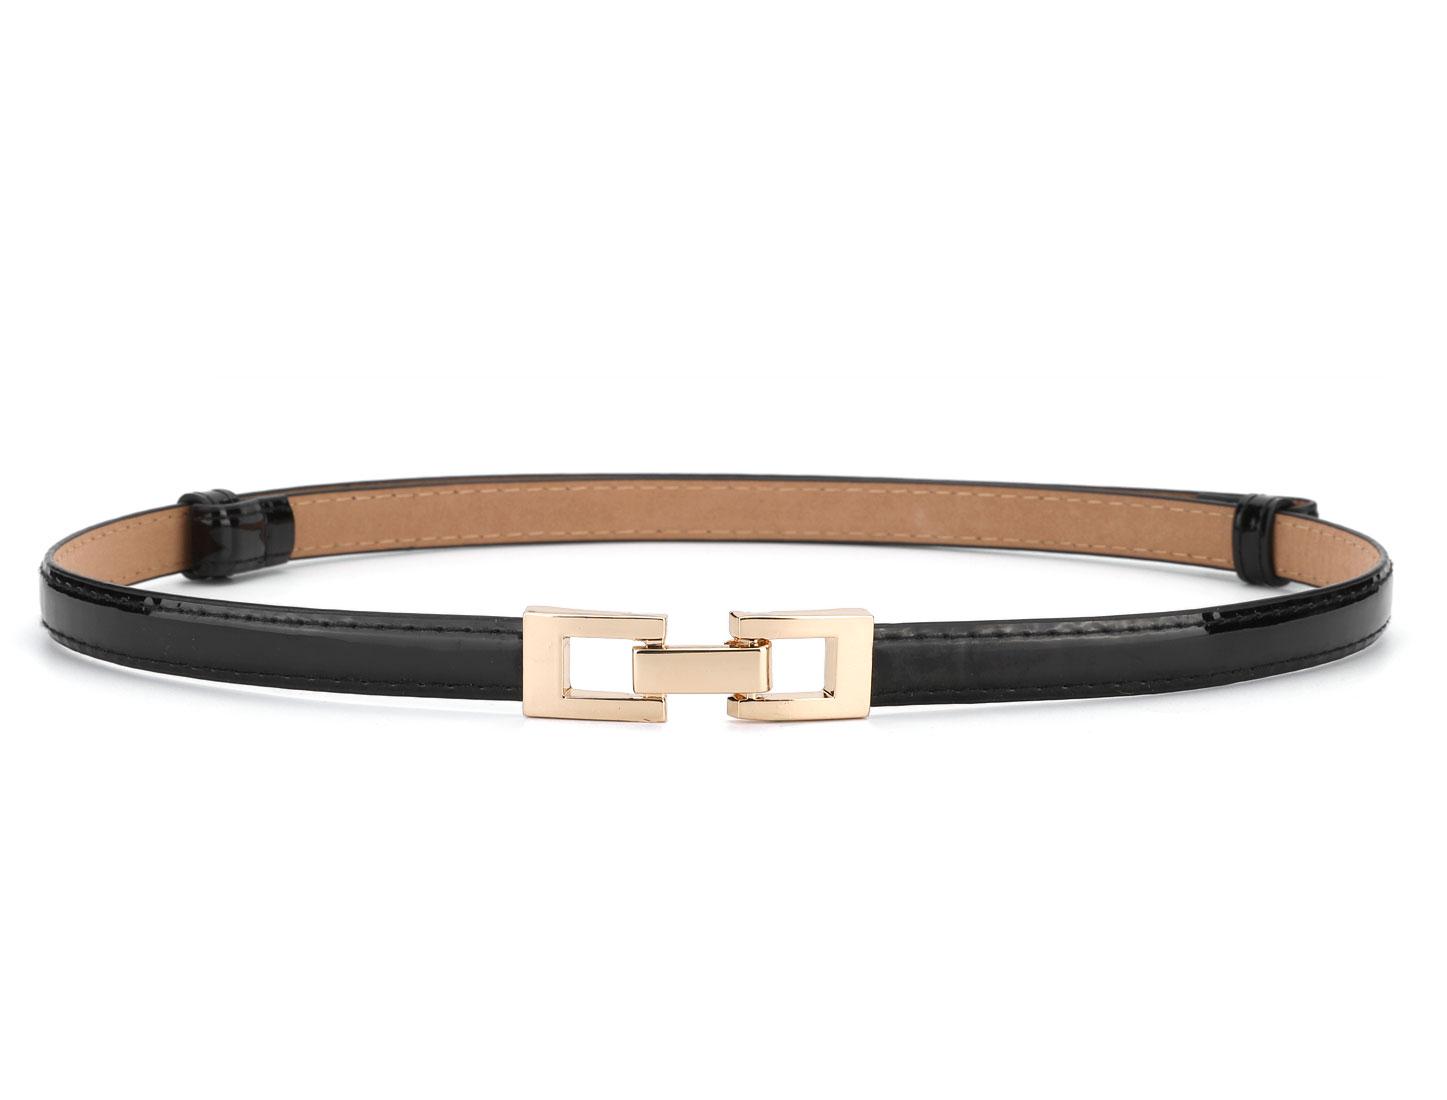 Metal Buckle Adjustable Stretchy Wide Waist Belt for Women Black Square Buckle